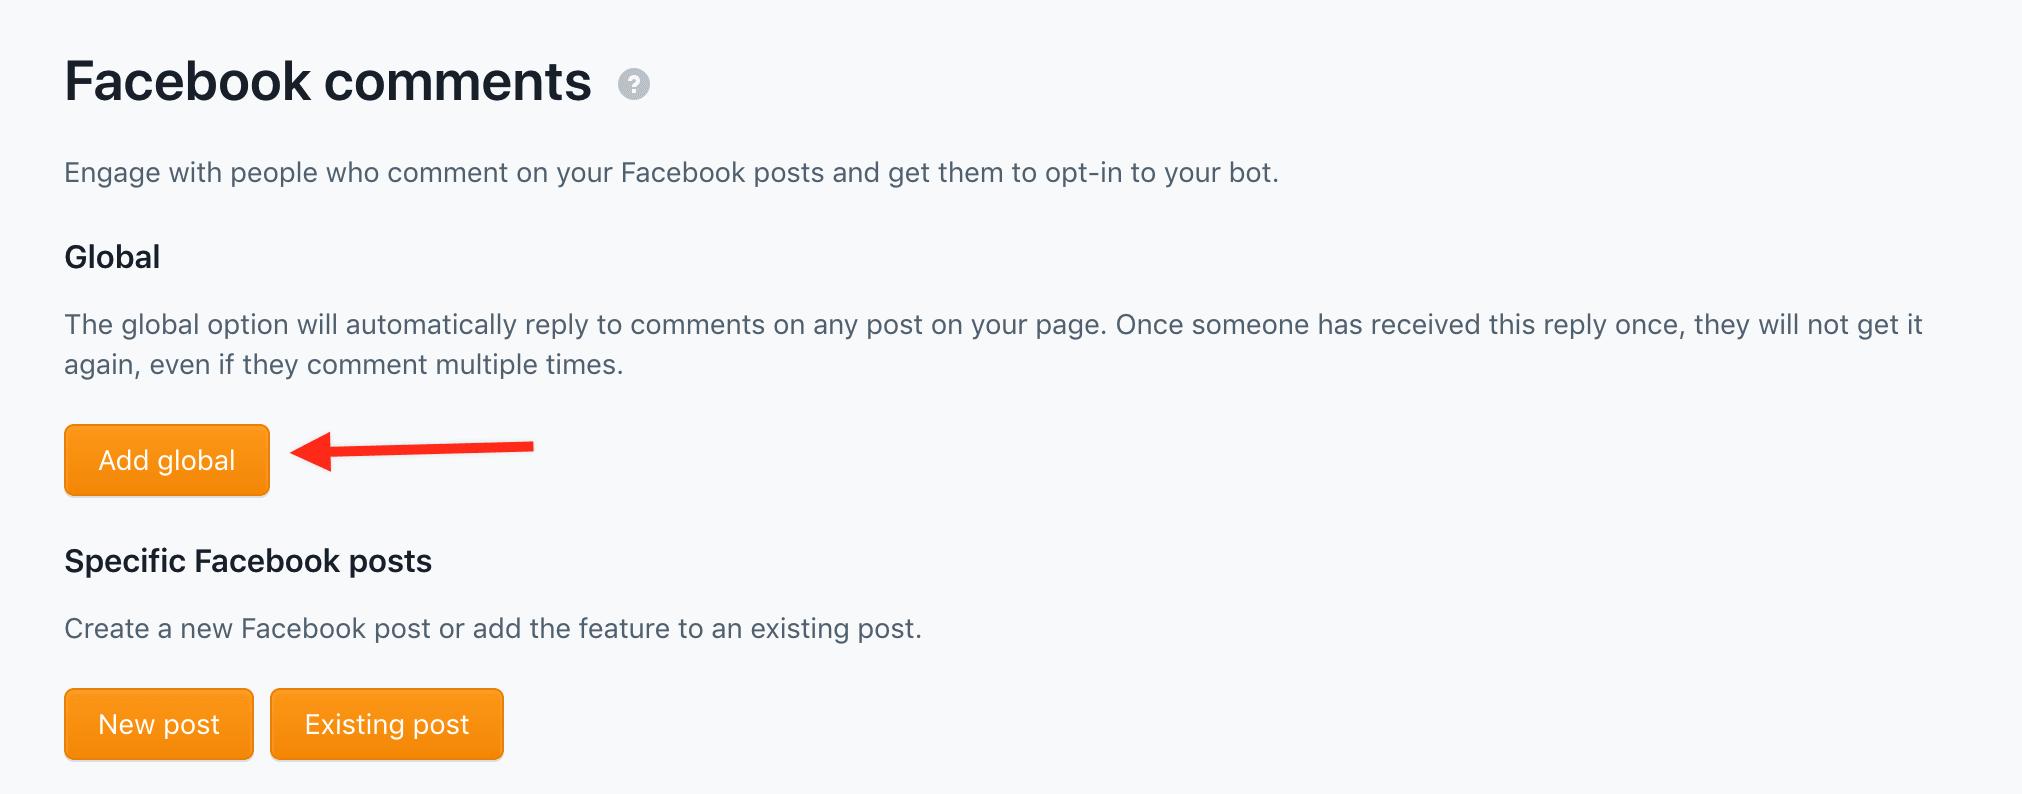 global facebook comment capture